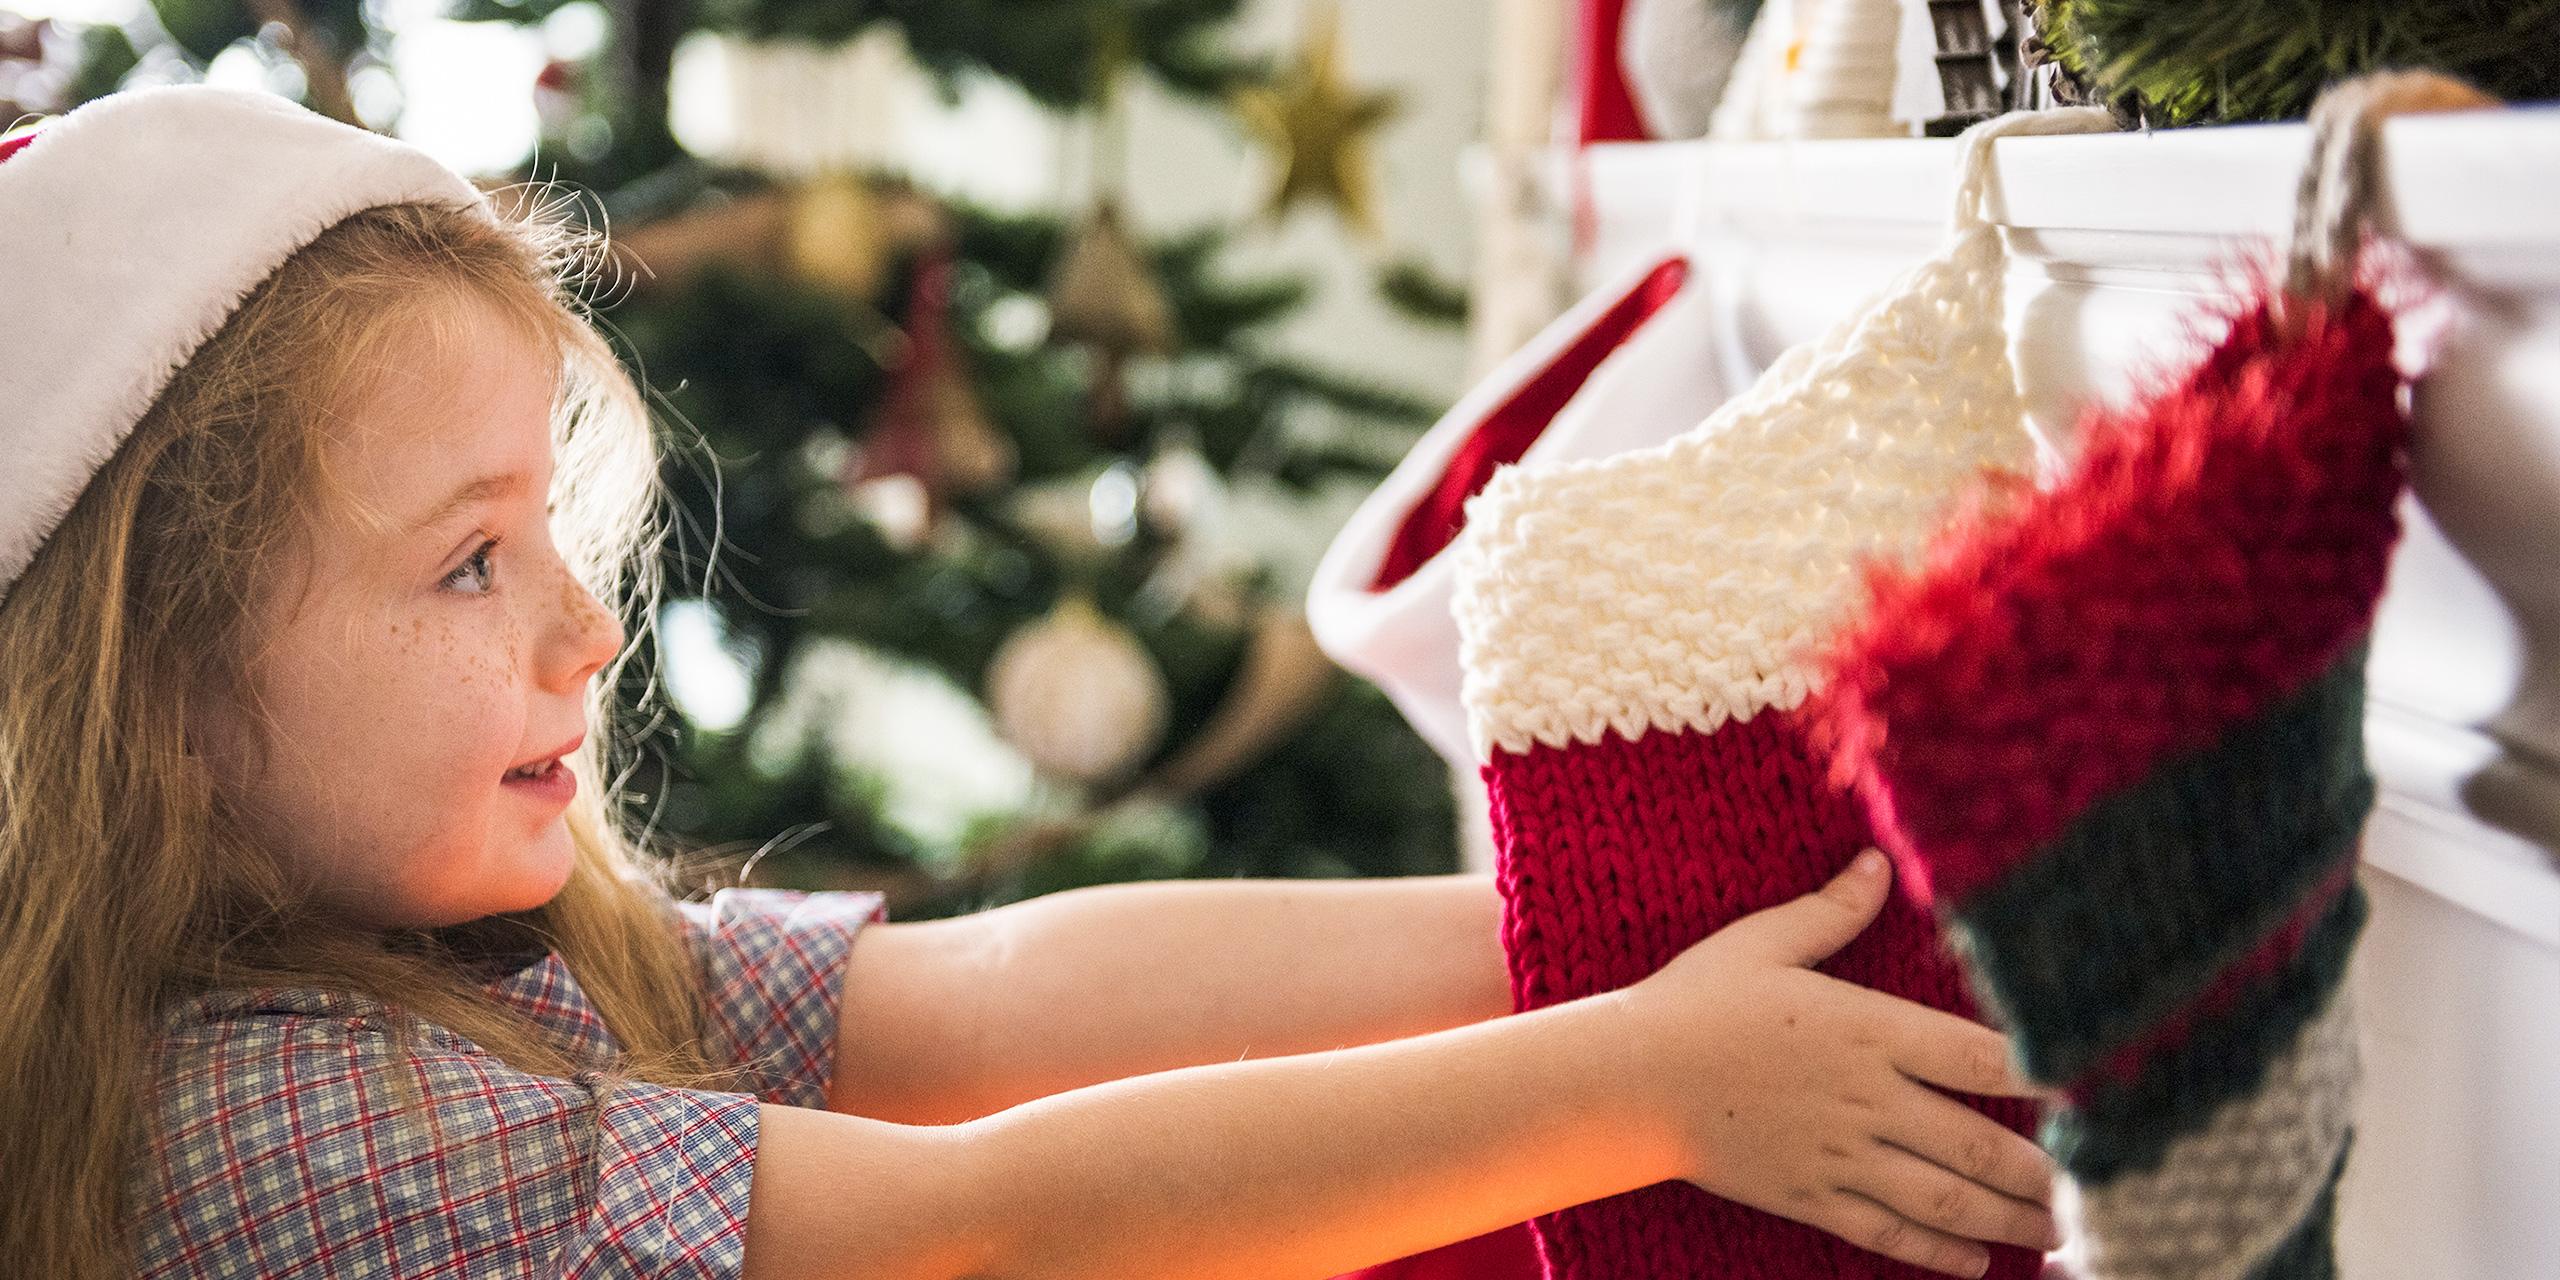 girl holding christmas stocking; Courtesy of Rawpixel/Shutterstock